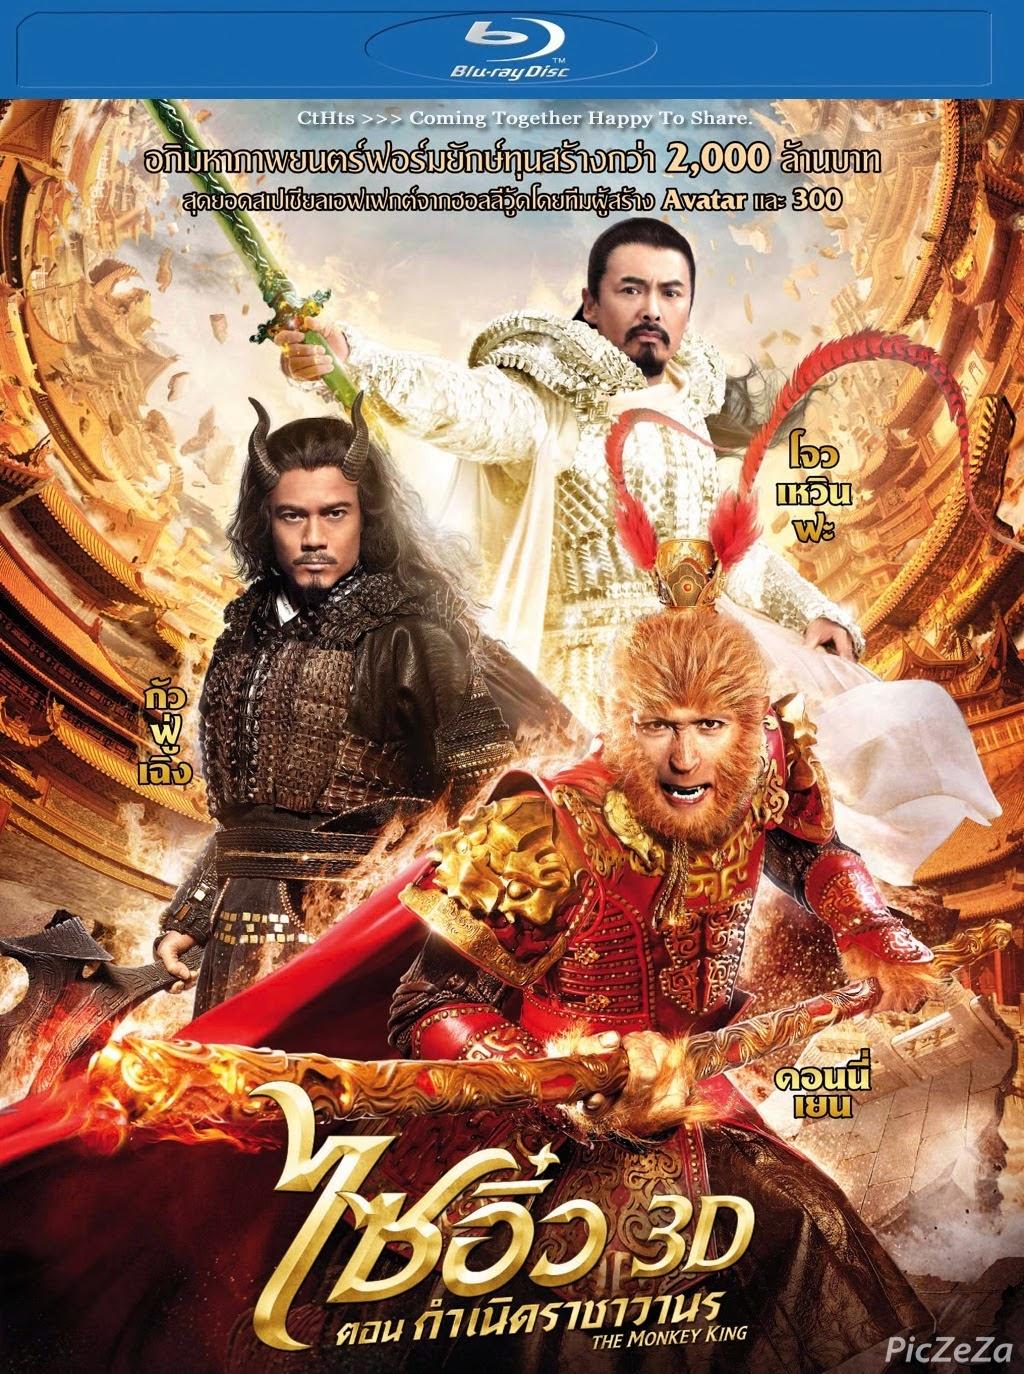 The Monkey king 2014 ไซอิ๋ว :ตอน กำเนิดราชาวานร